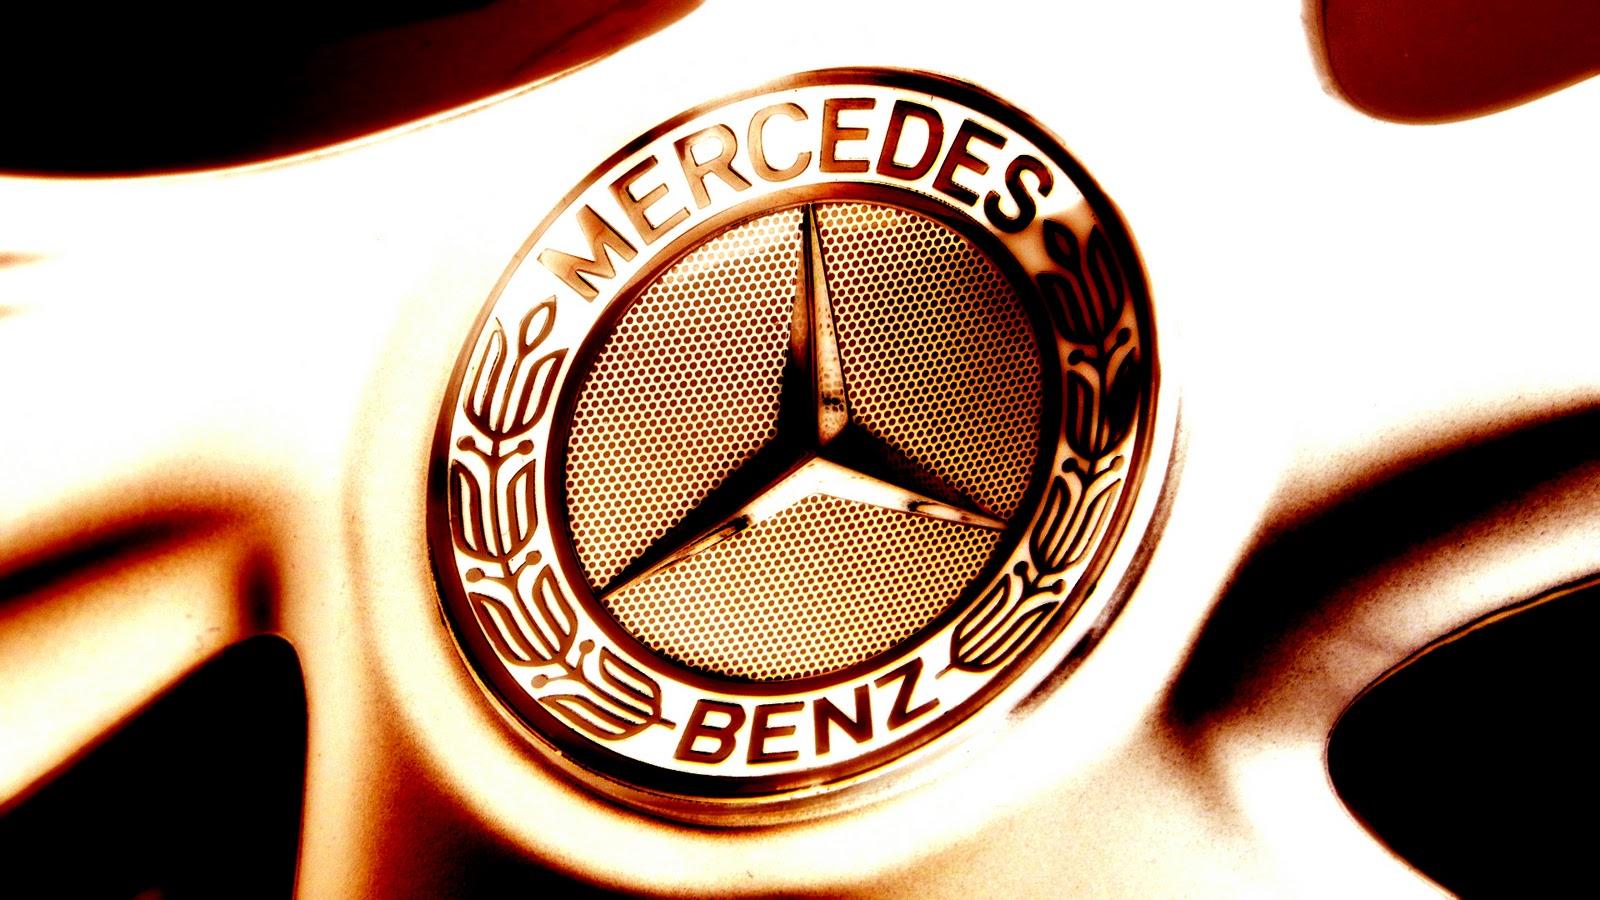 Mercedes Logo Wallpaper 1600x900